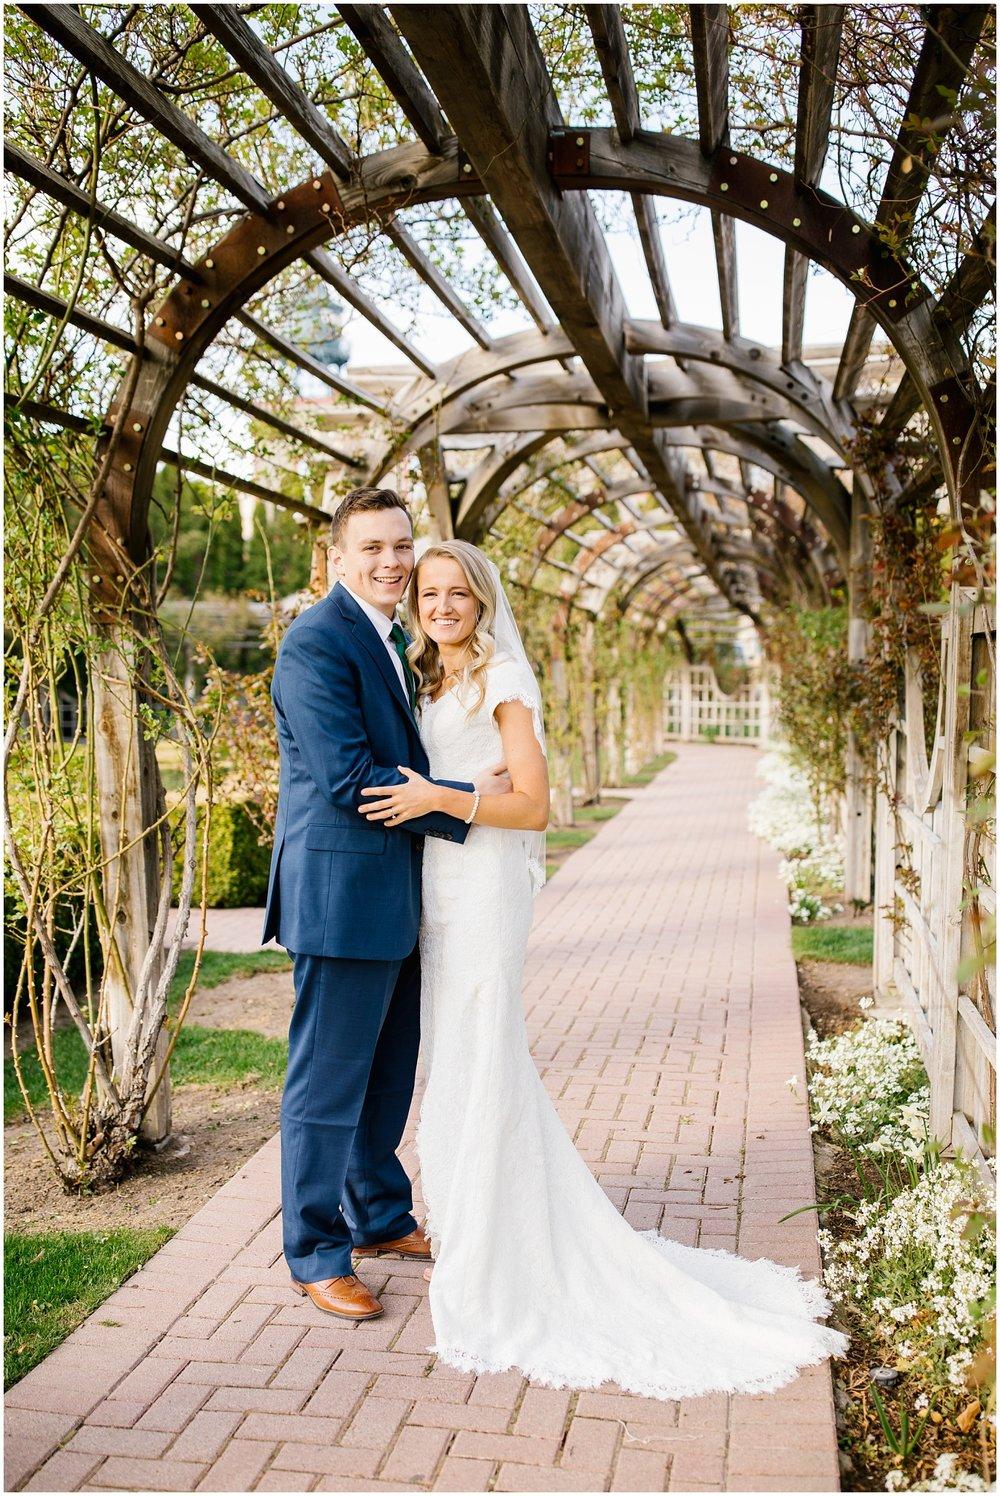 TA-Bridals-9_Lizzie-B-Imagery-Utah-Wedding-Photographer-Park-City-Salt-Lake-City-Thanksgiving-Point-Ashton-Gardens-Lehi-Utah.jpg